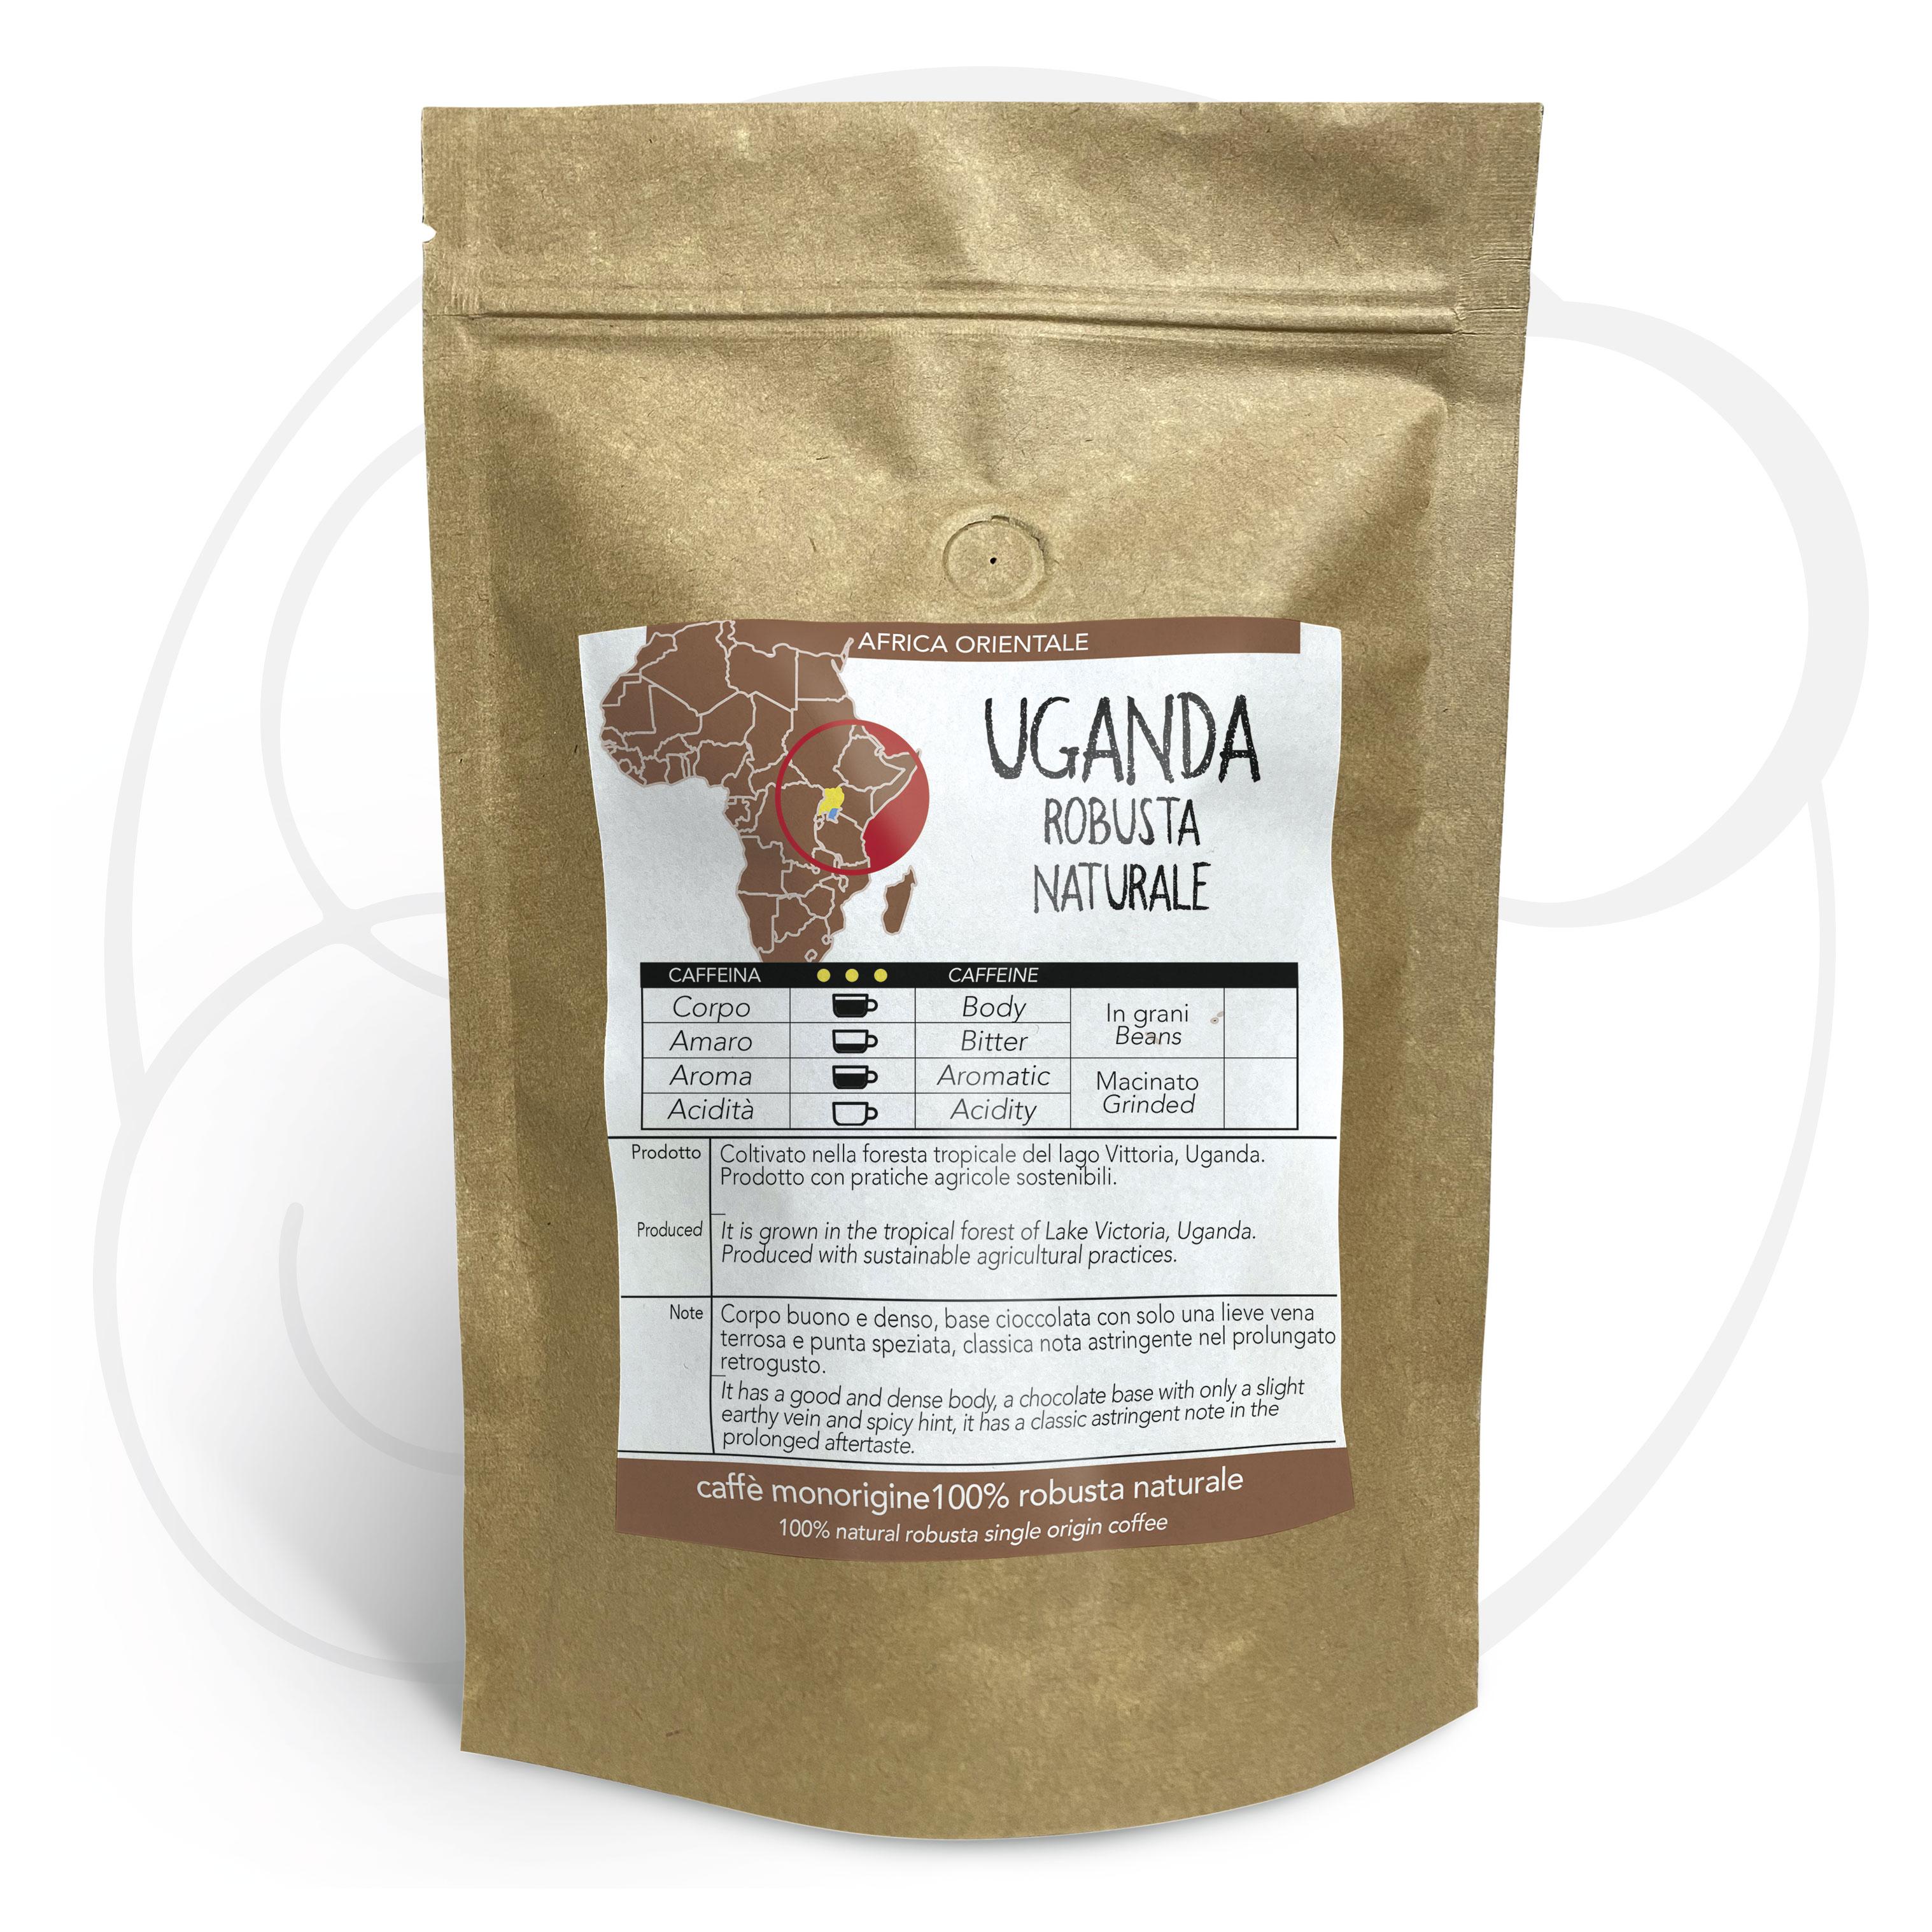 Caffè monorigine Uganda Robusta Naturale, confezioni da 250 gr e 1kg